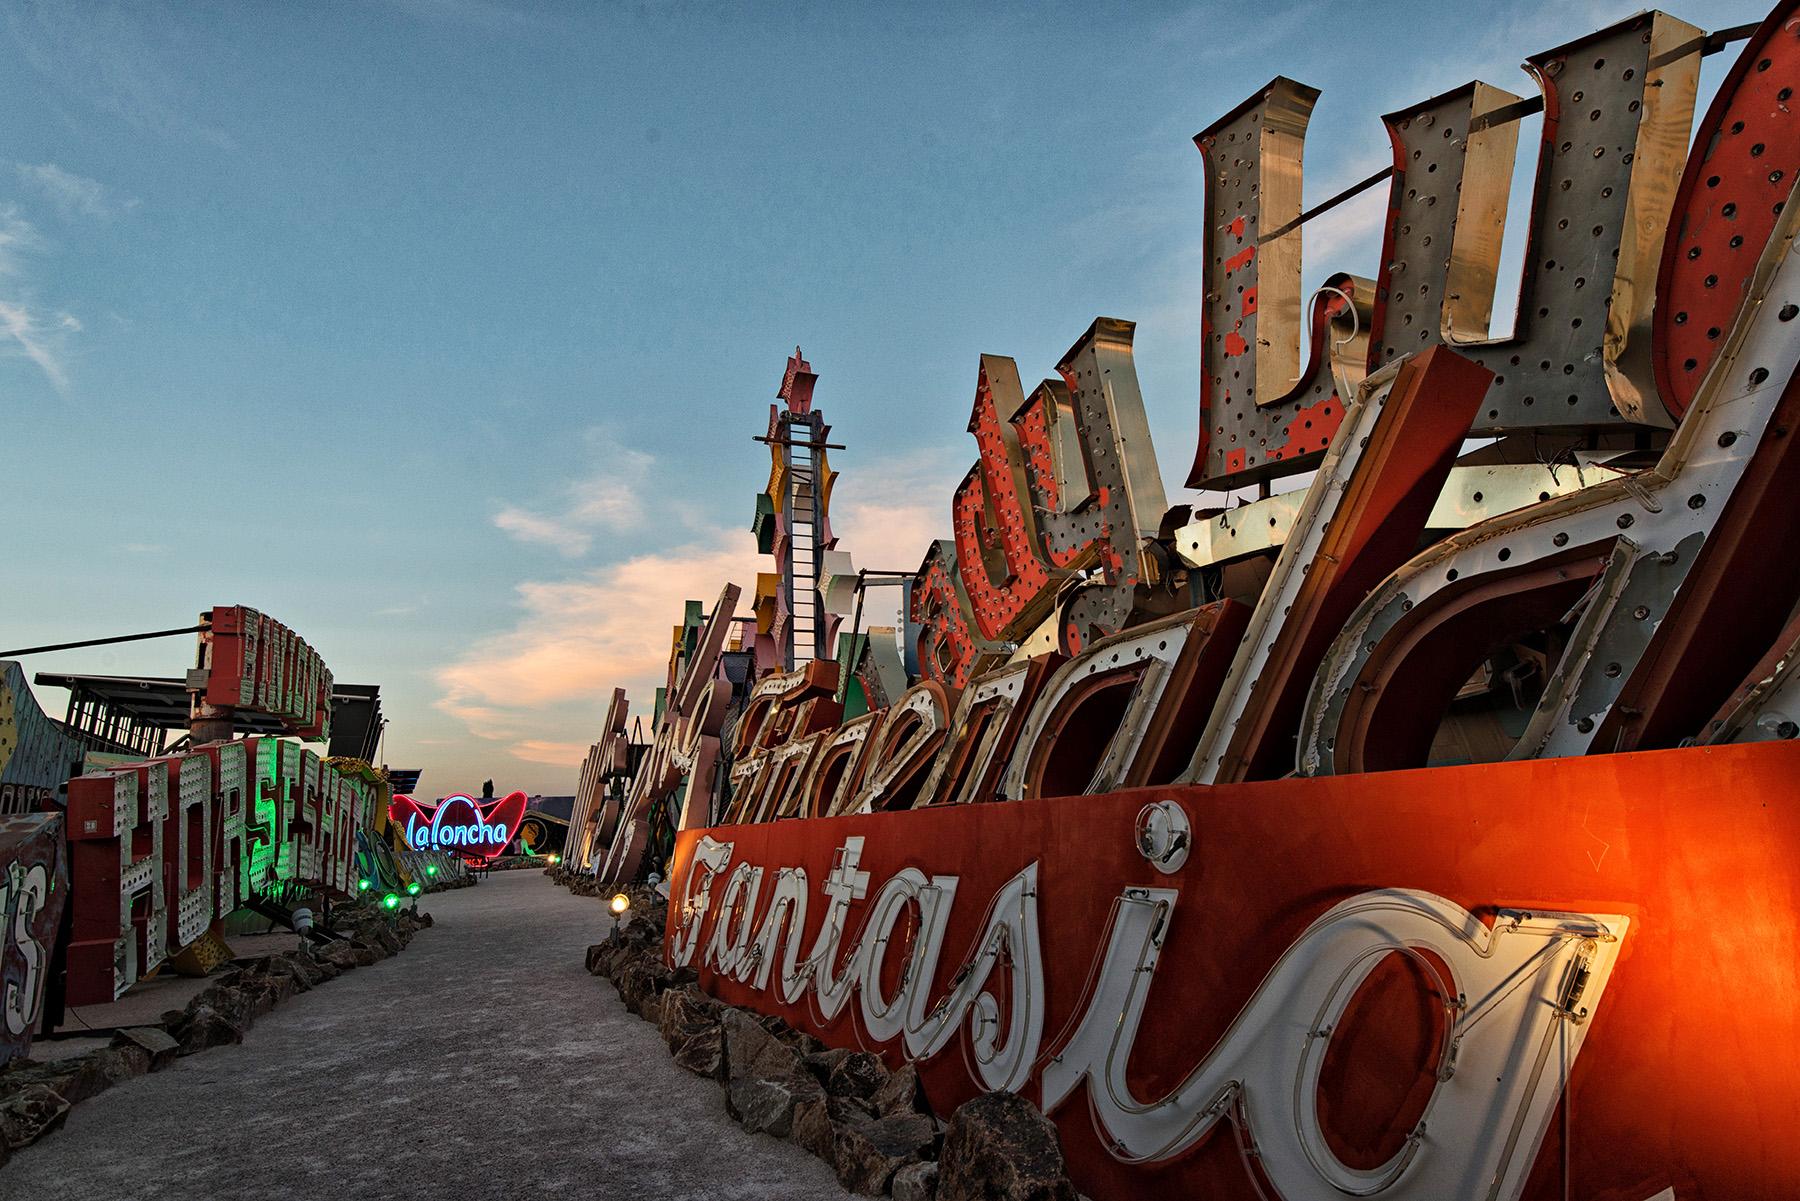 Exploring Las Vegas  Neon Museum Boneyard  David Giral